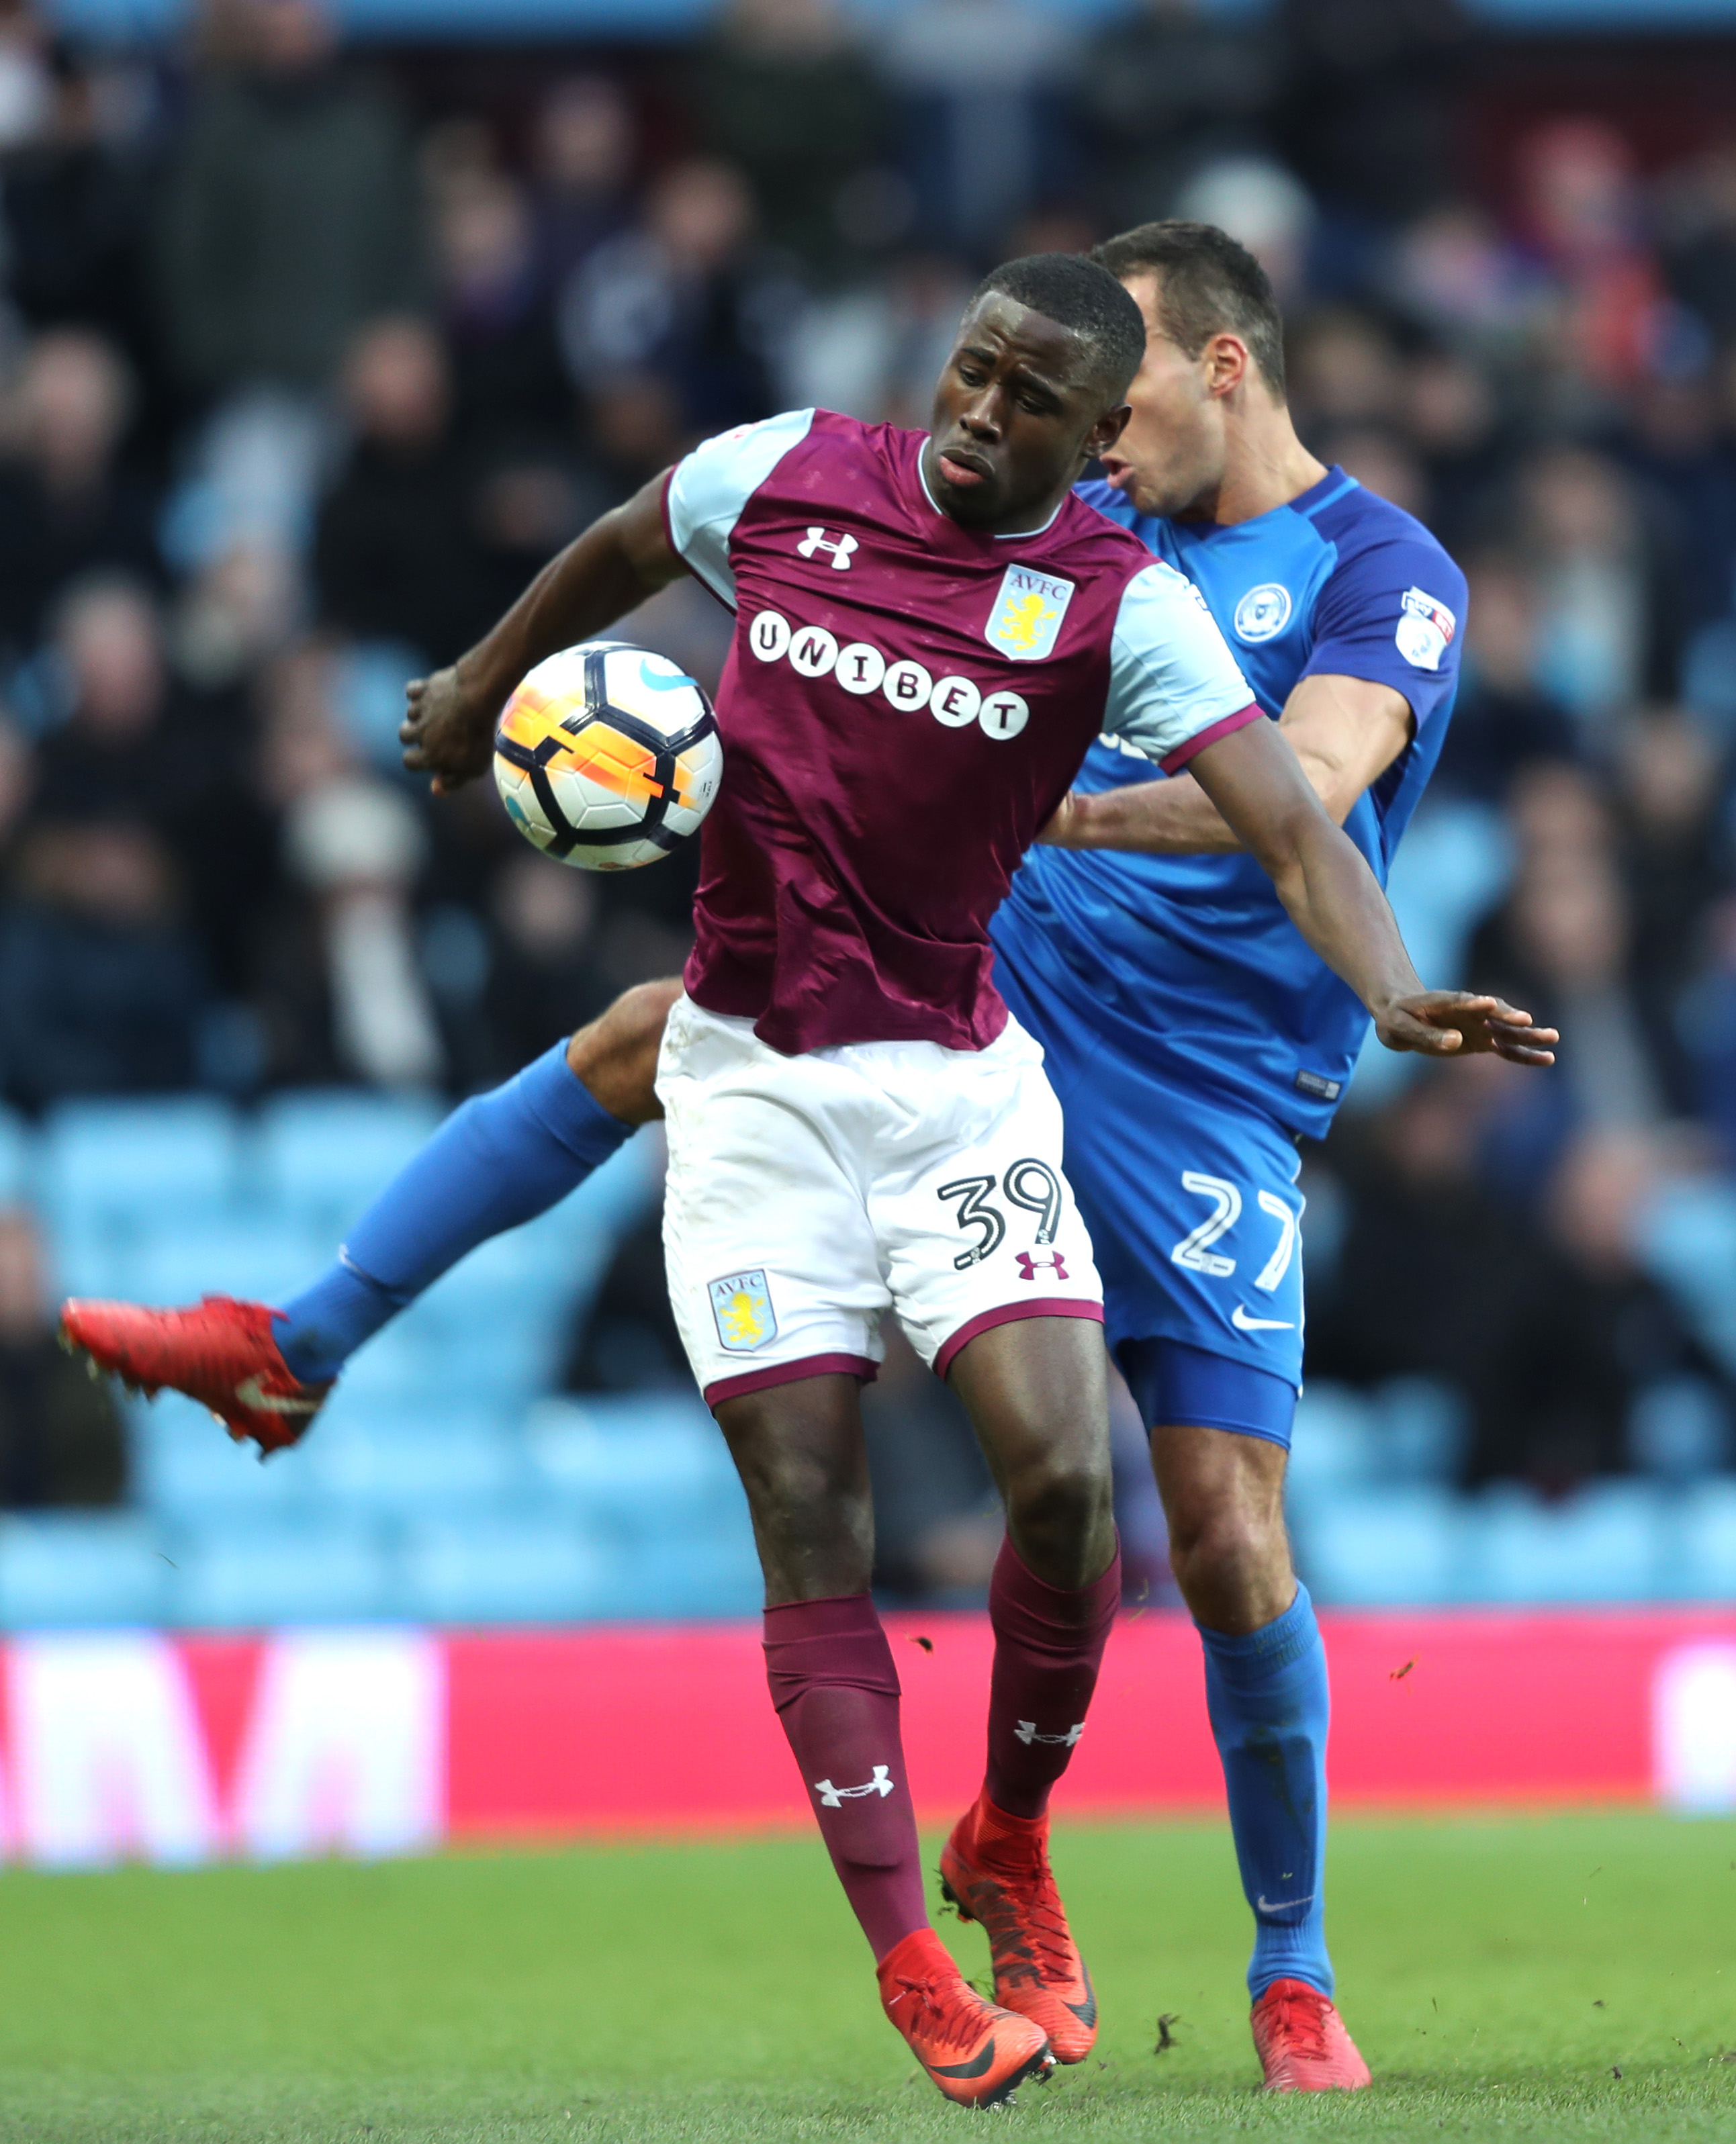 Aston Villa v Peterborough United - The Emirates FA Cup Third Round